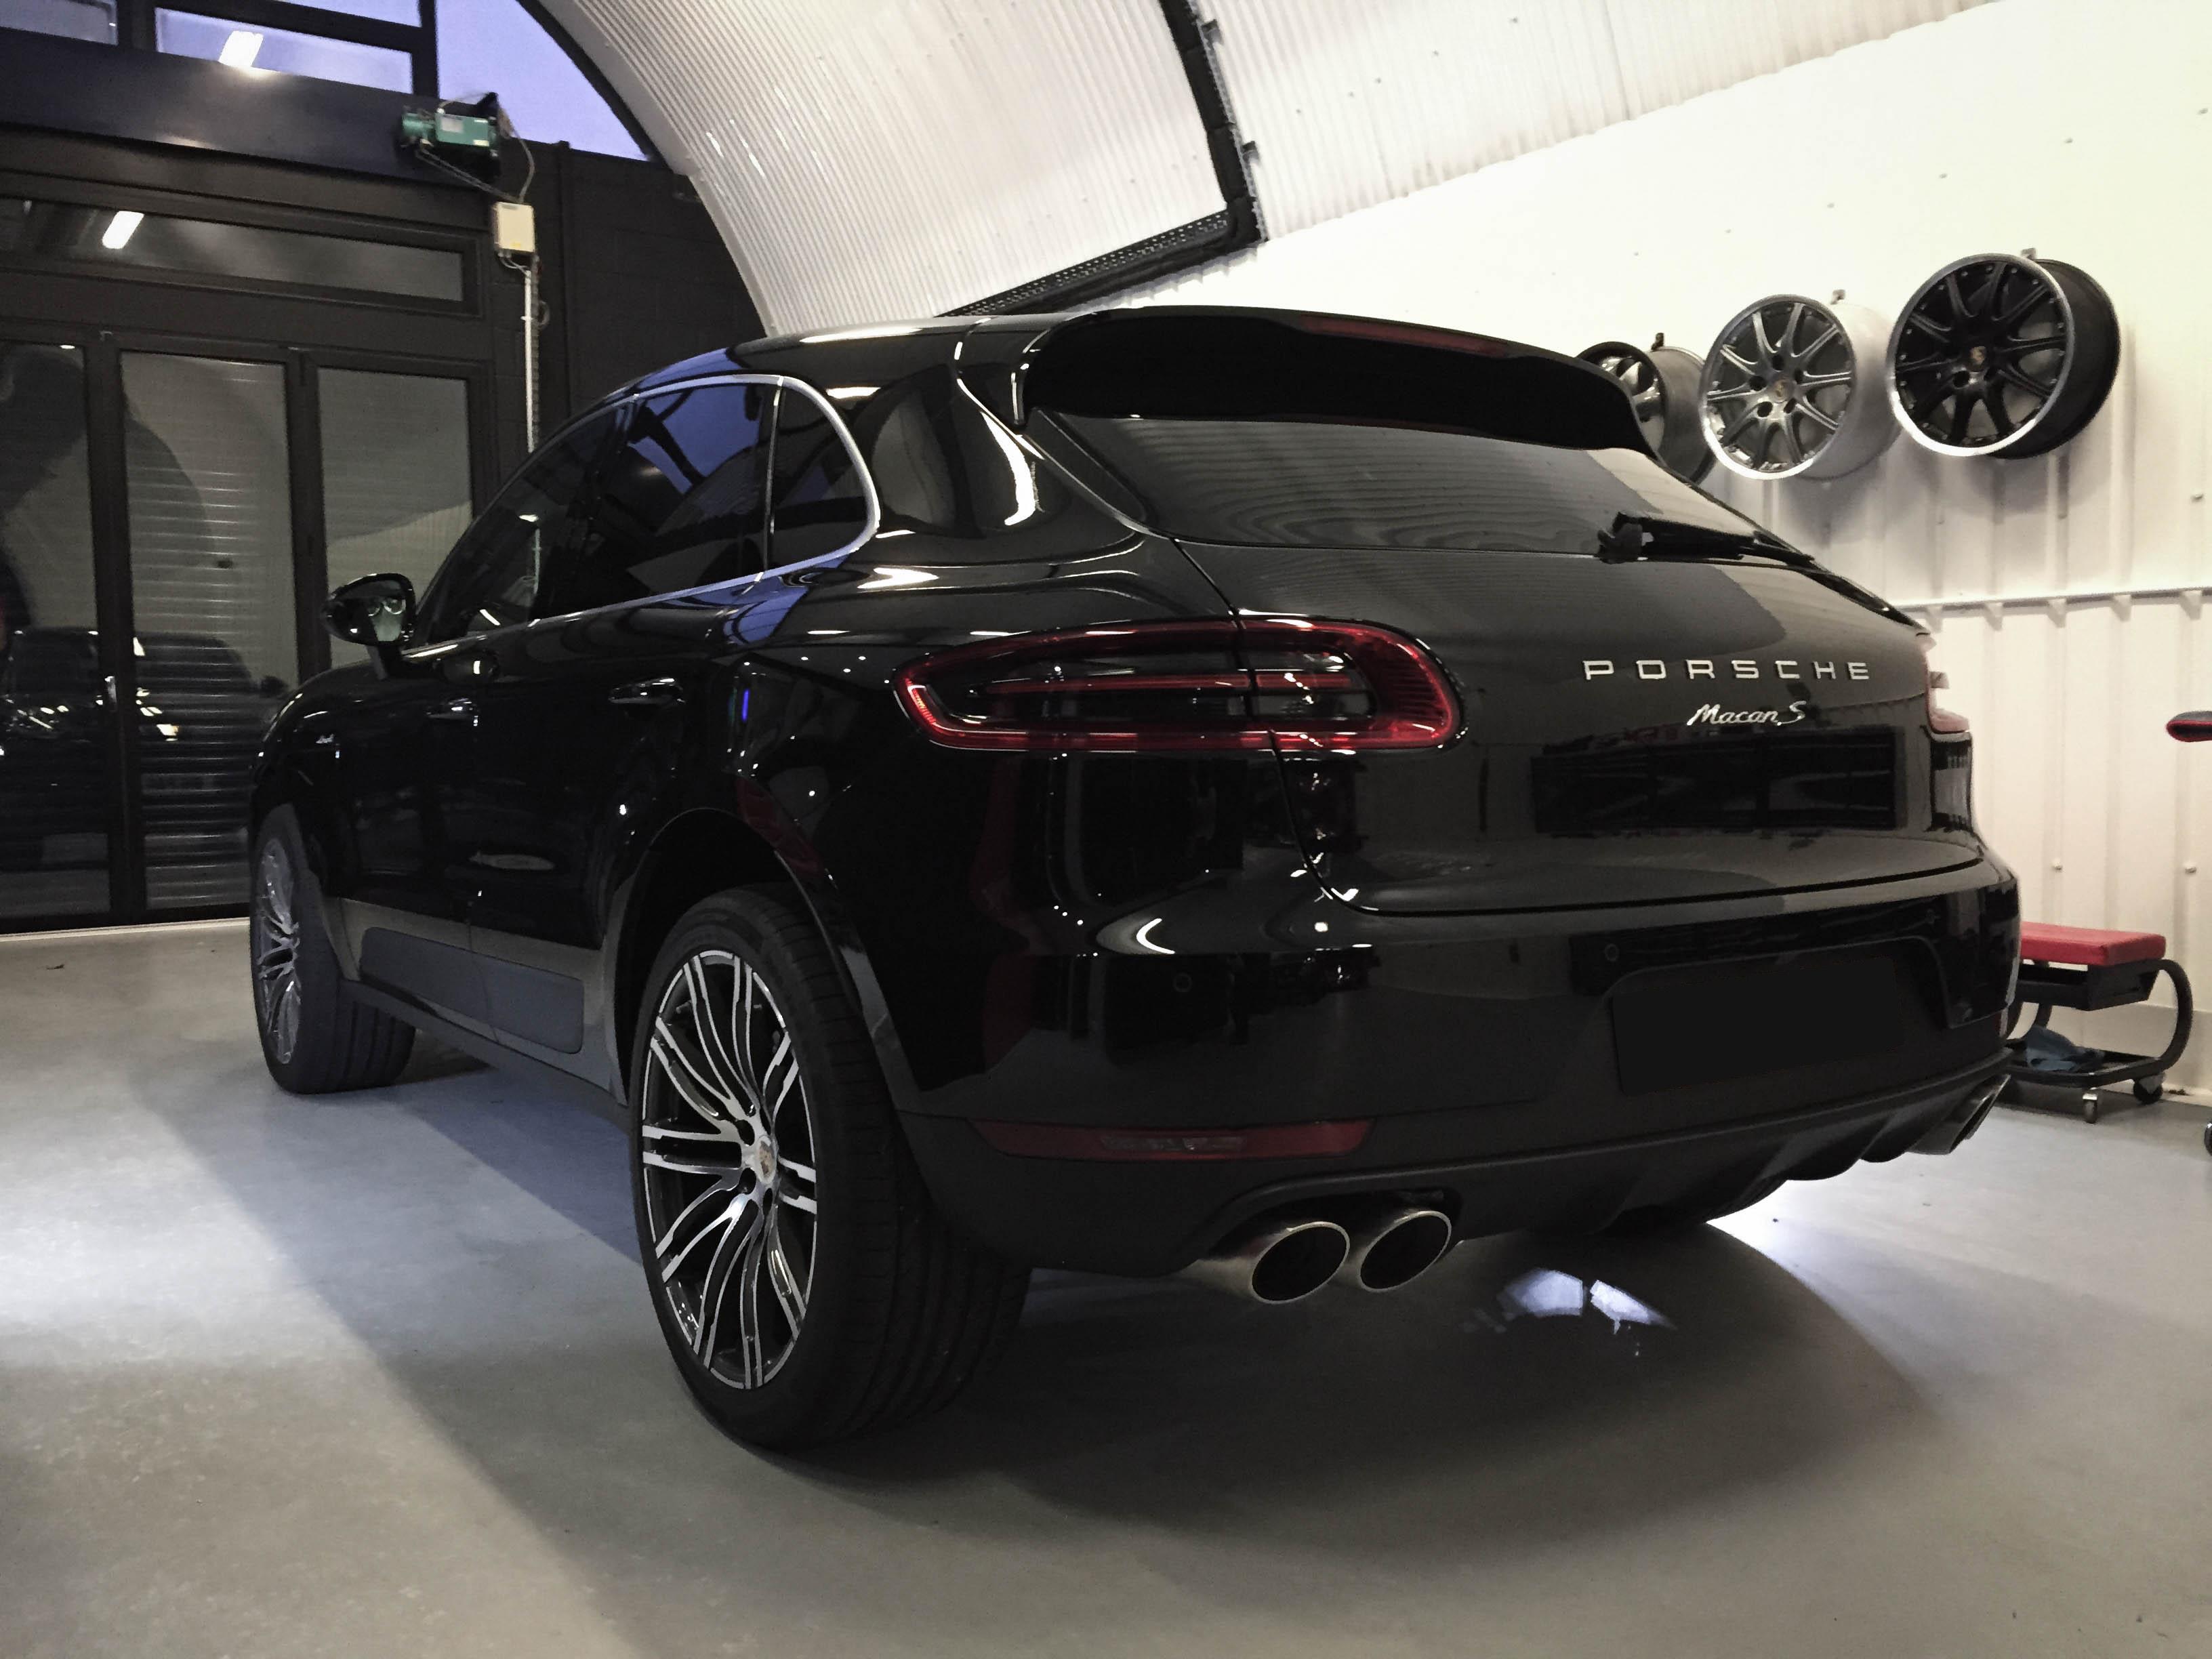 Porsche Macan – Rear